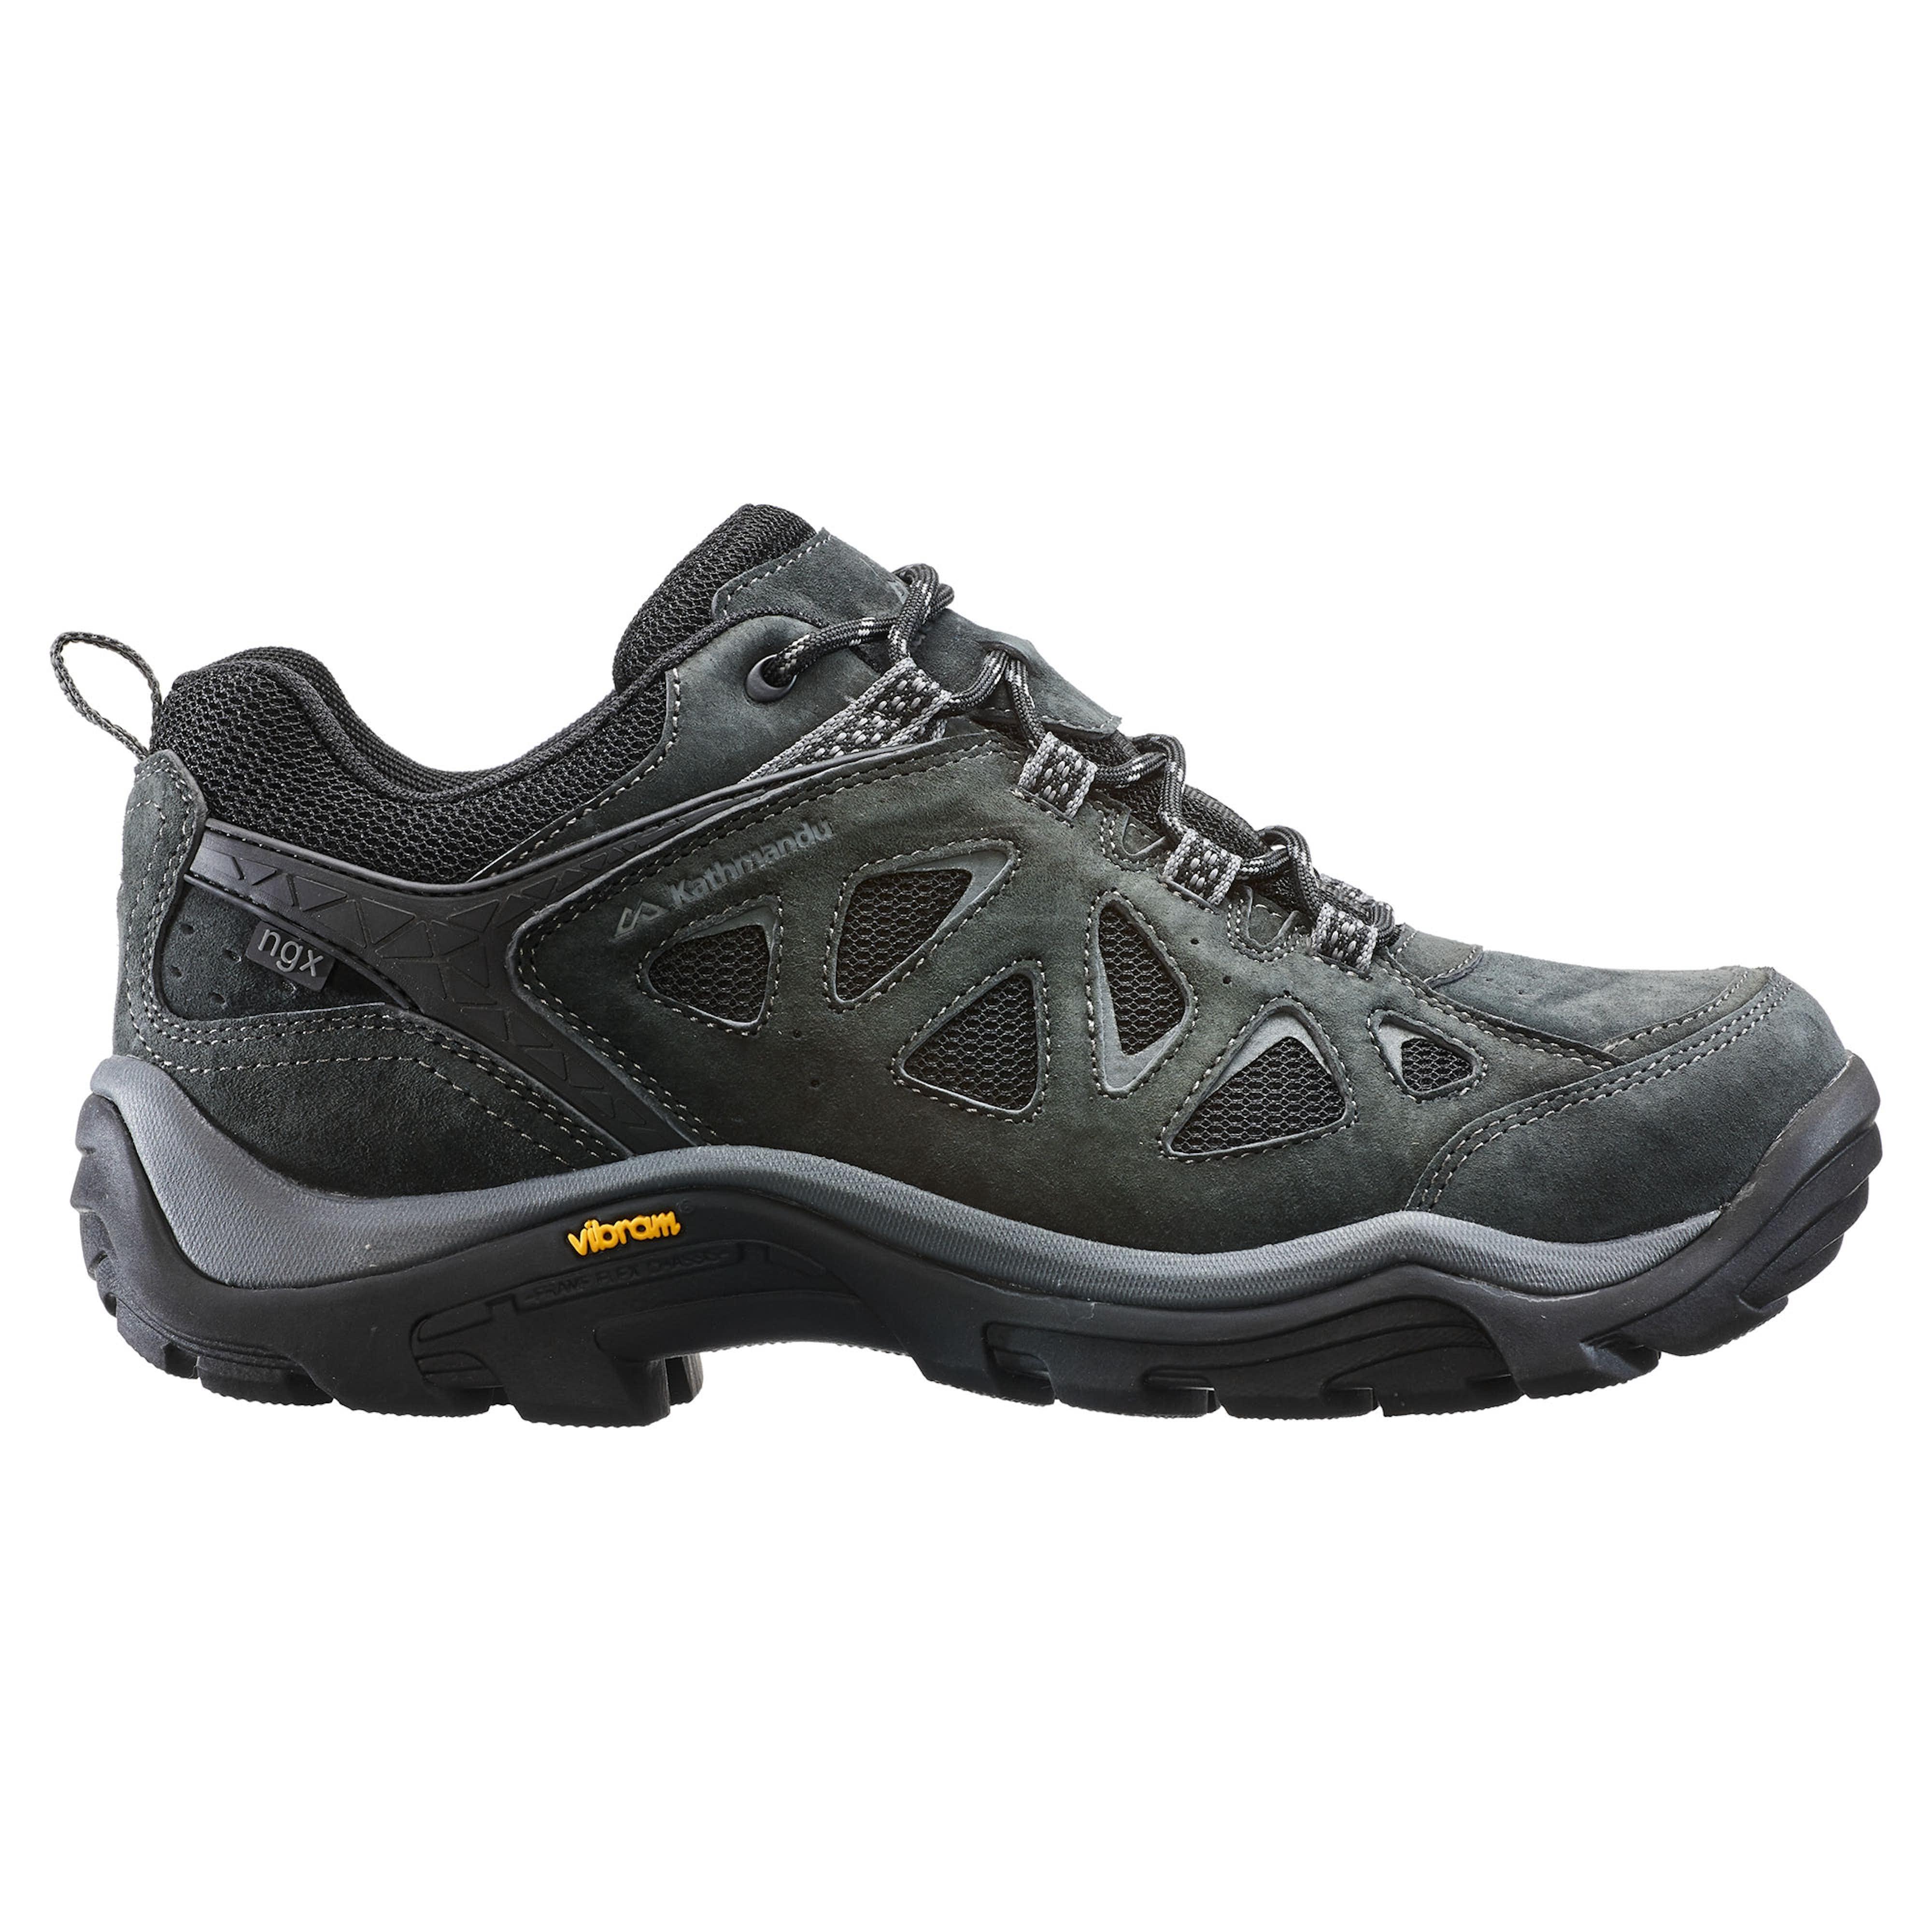 a63c235cceba Kathmandu Footwear  Hiking Boots